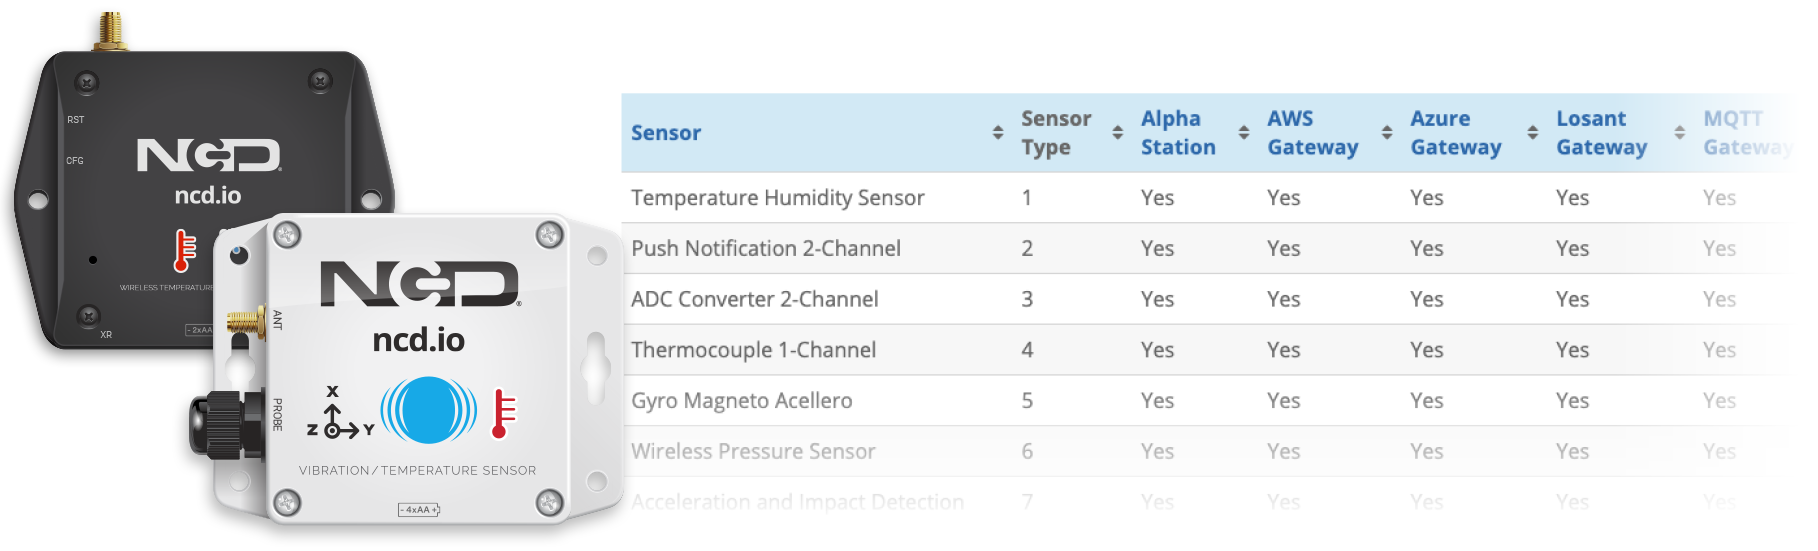 Wireless IoT Sensors Support Map